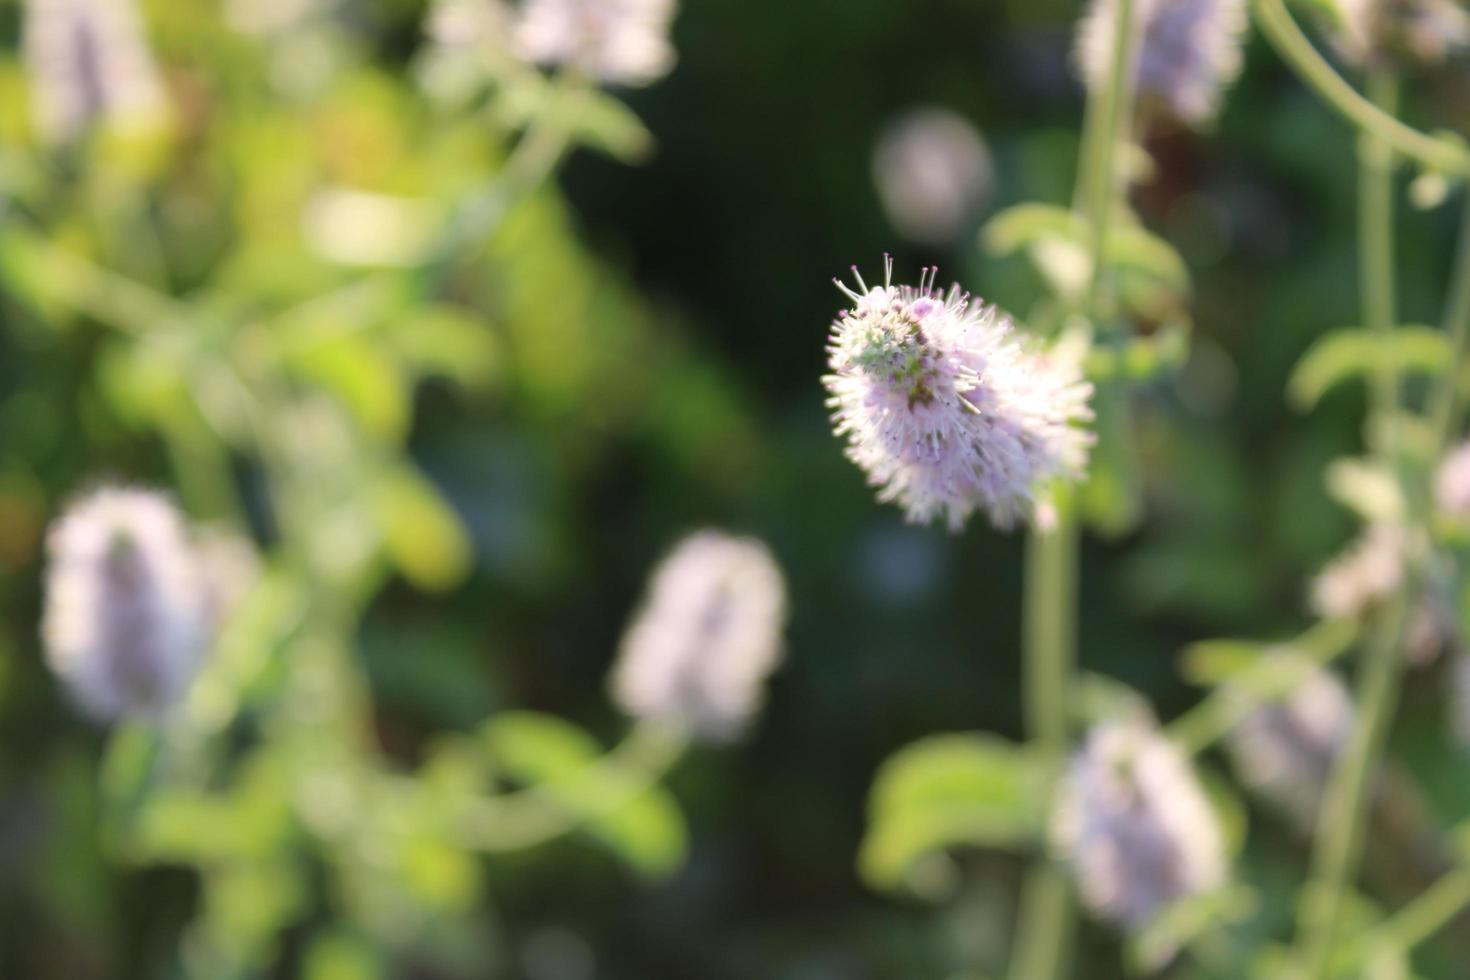 Planta de lavanda en primavera con detalles macro foto